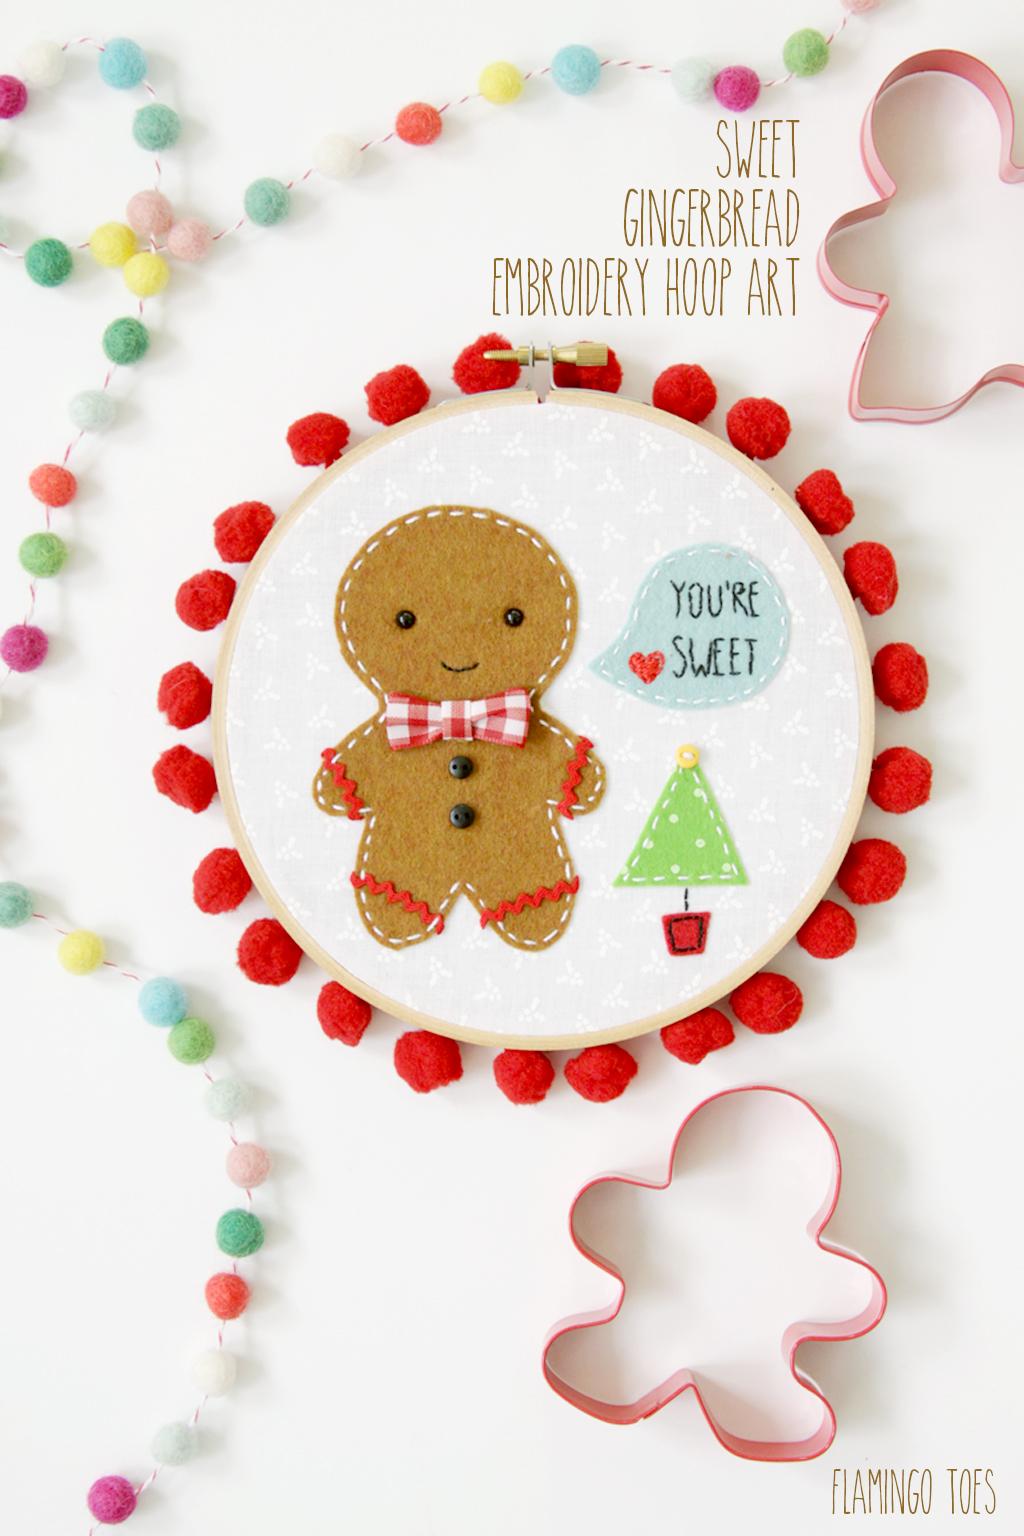 DIY Embroidery Hoop Art   Sweet Gingerbread Art   Christmas Gift Idea   Crafts   Ornament